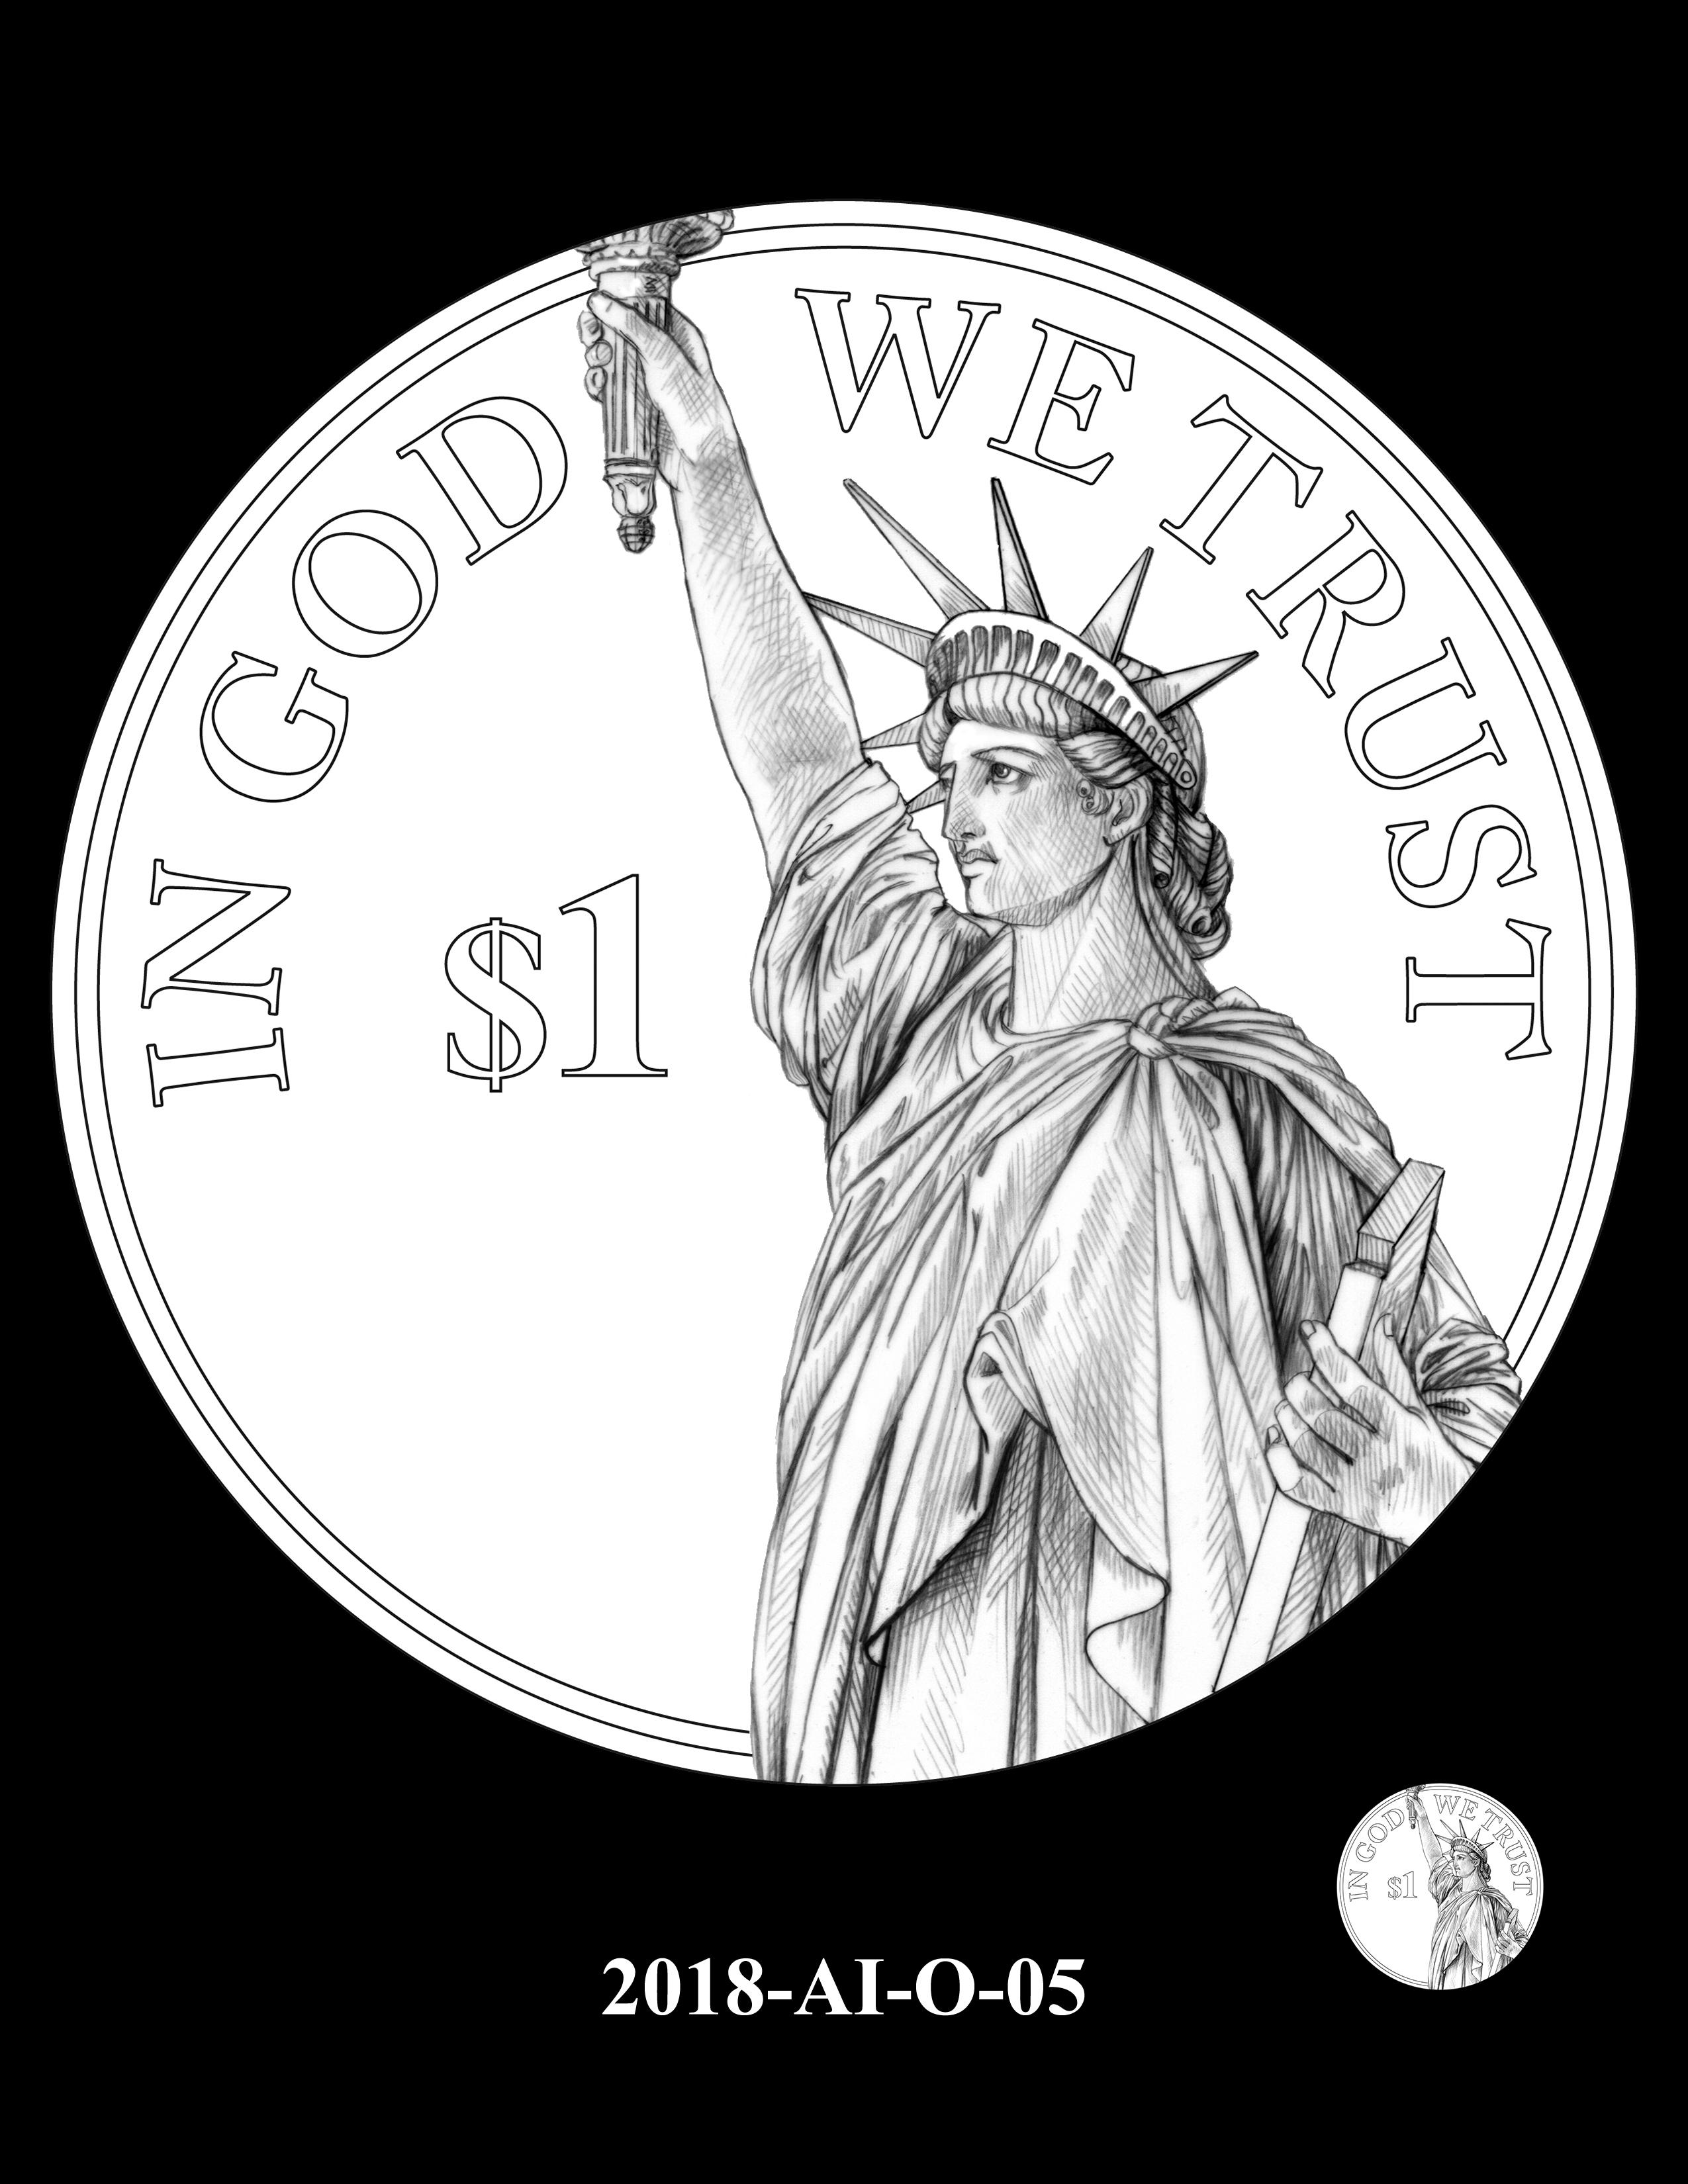 2018-AI-O-05 -- 2018 American Innovation $1 Coin